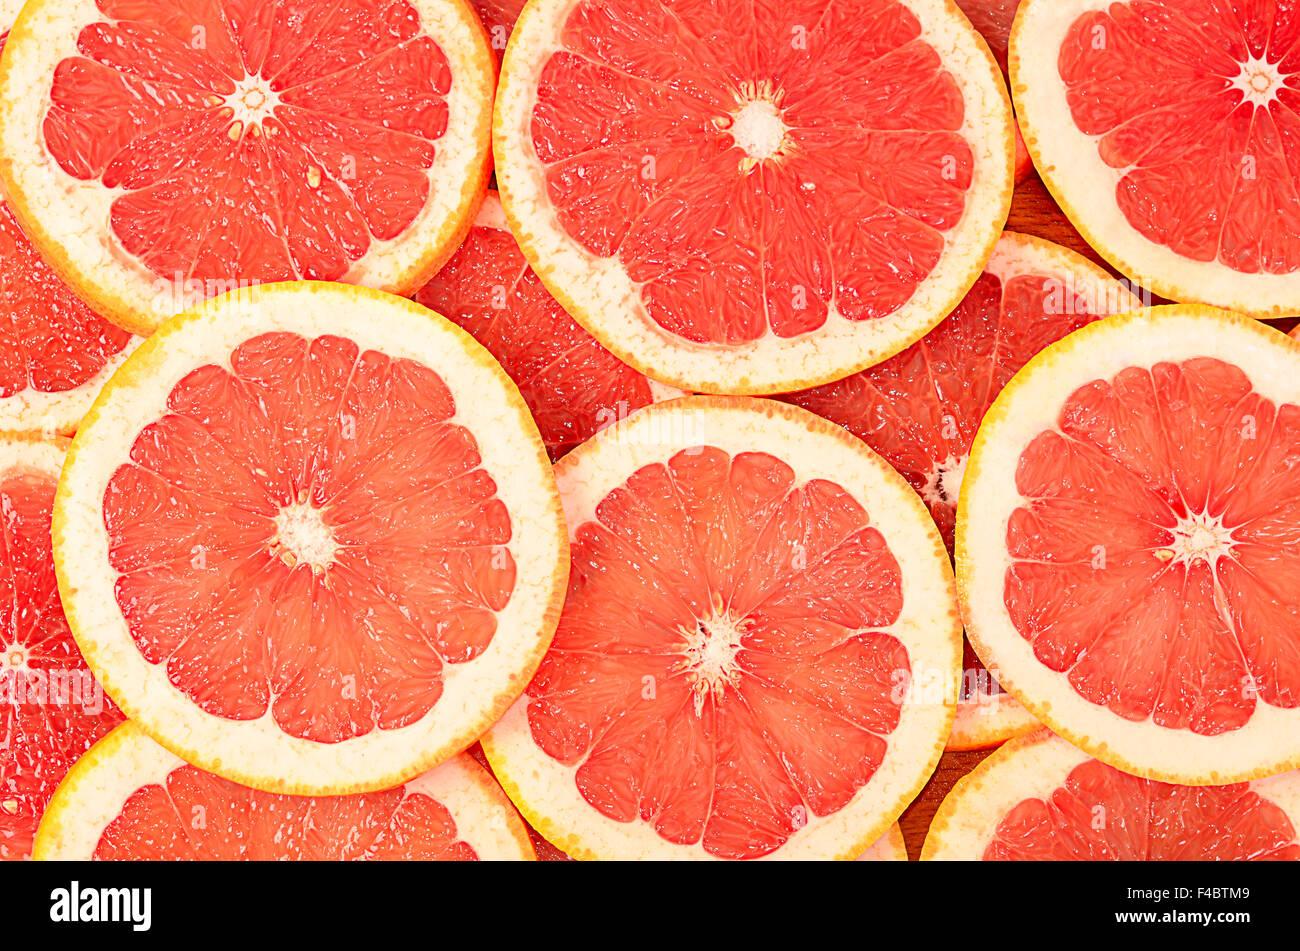 Fresh grapefruit as a background - Stock Image